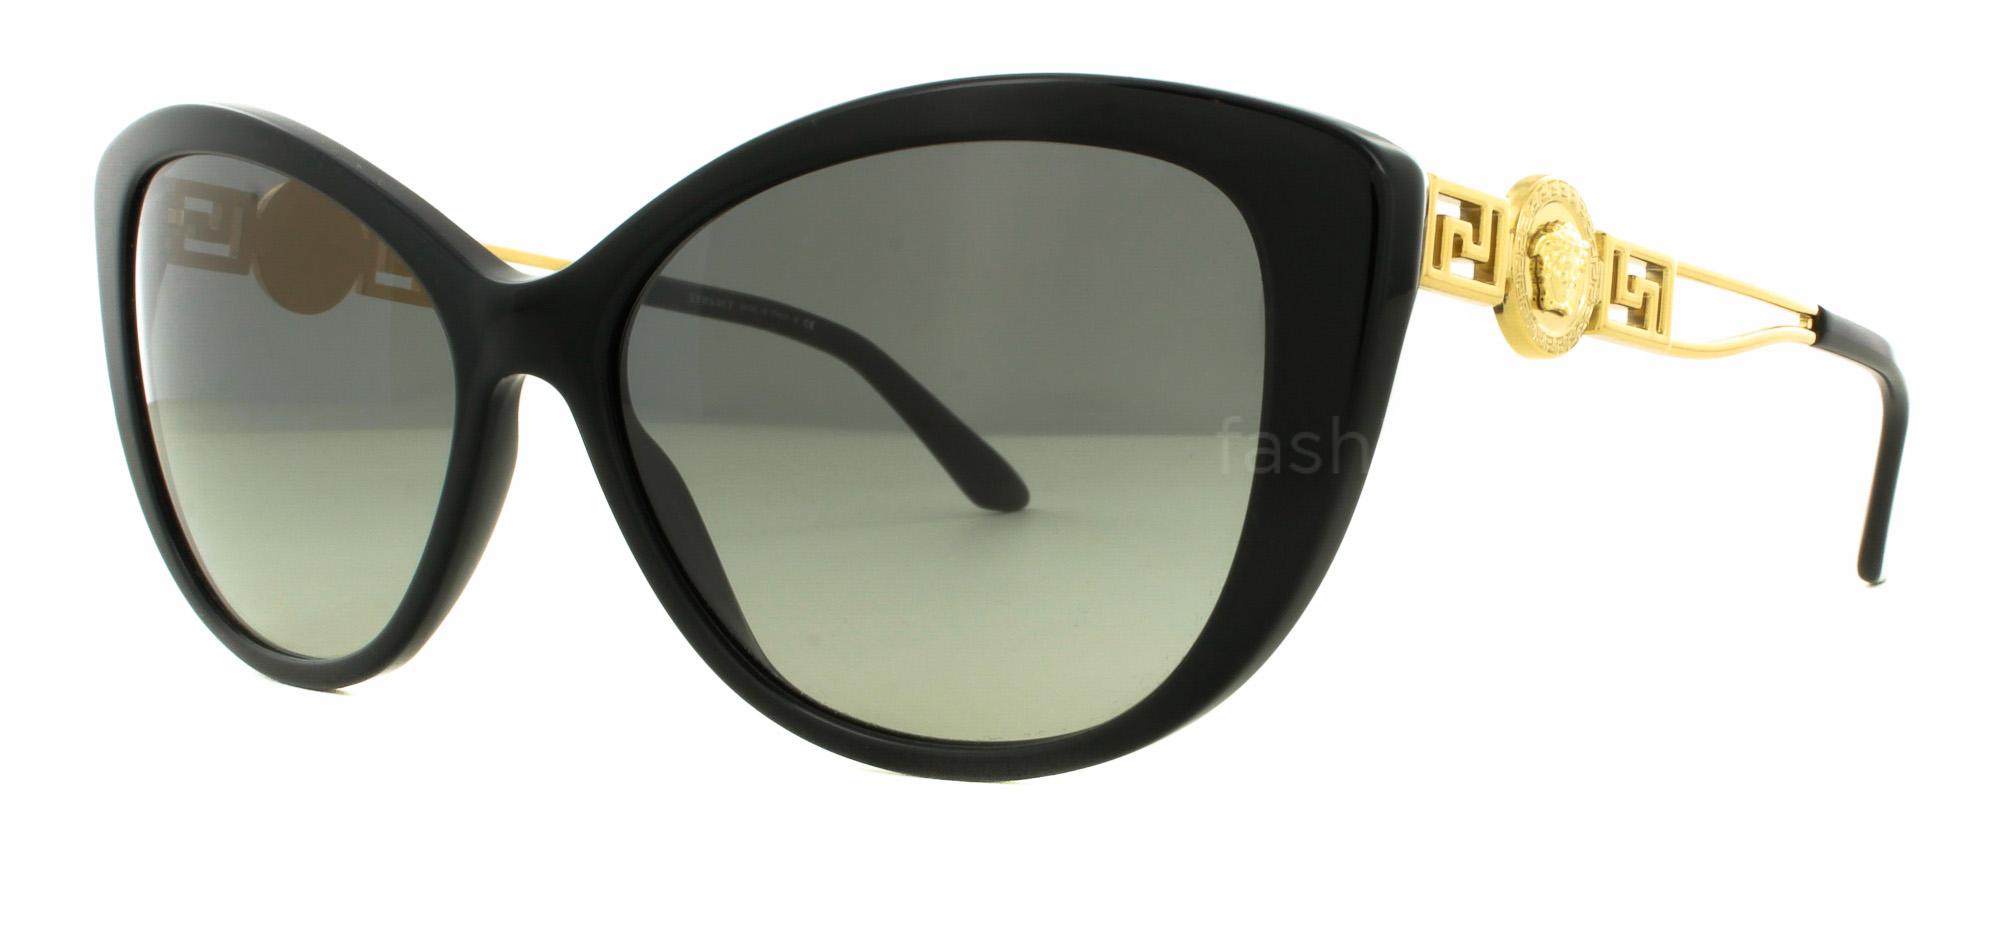 Versace 4295 sunglasses for Decor my eyes